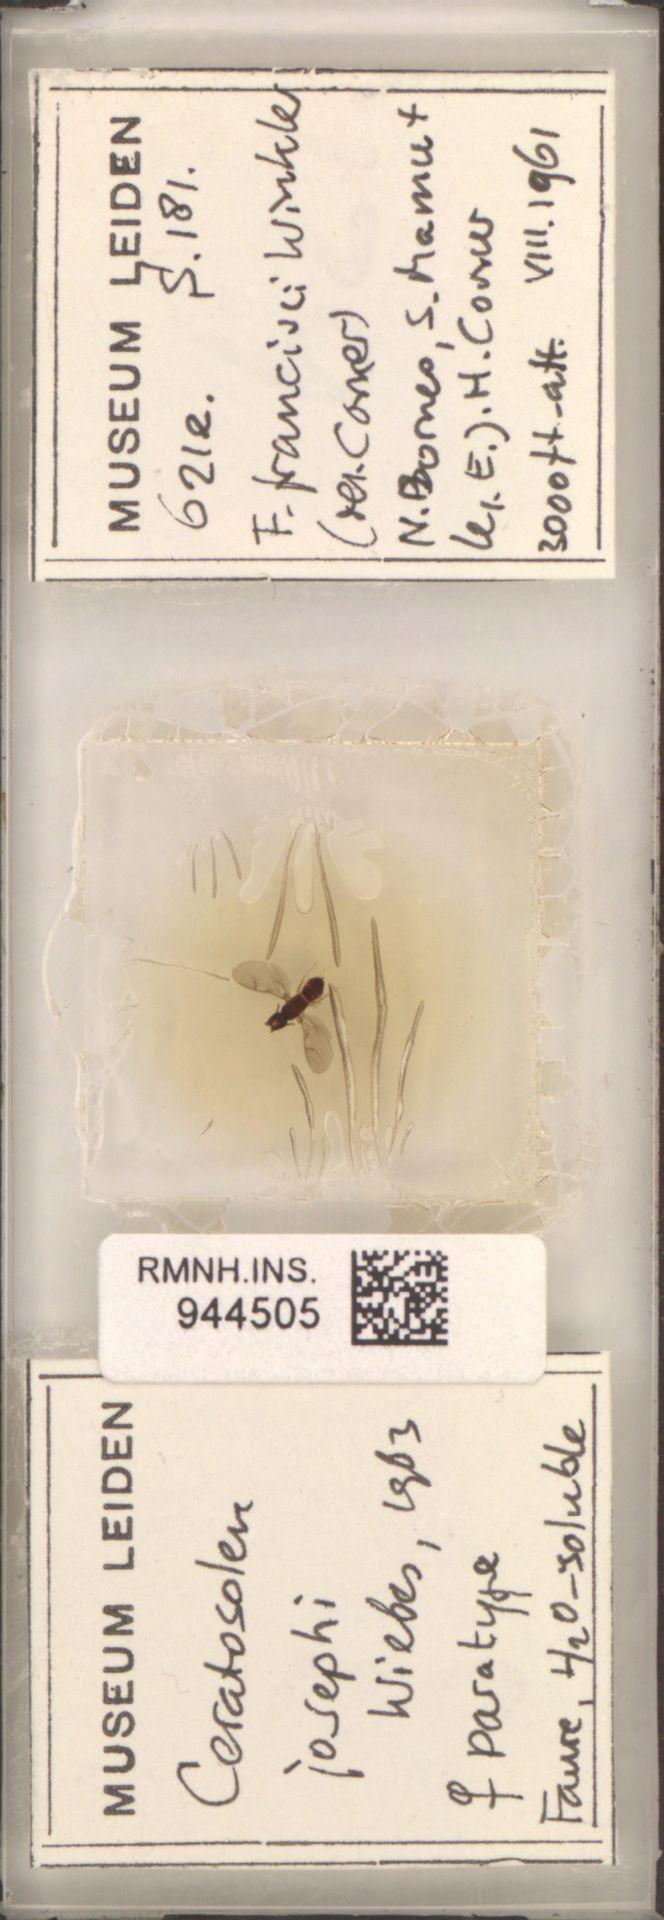 RMNH.INS.944505 | Ceratosolen josephi Wiebes, 1963